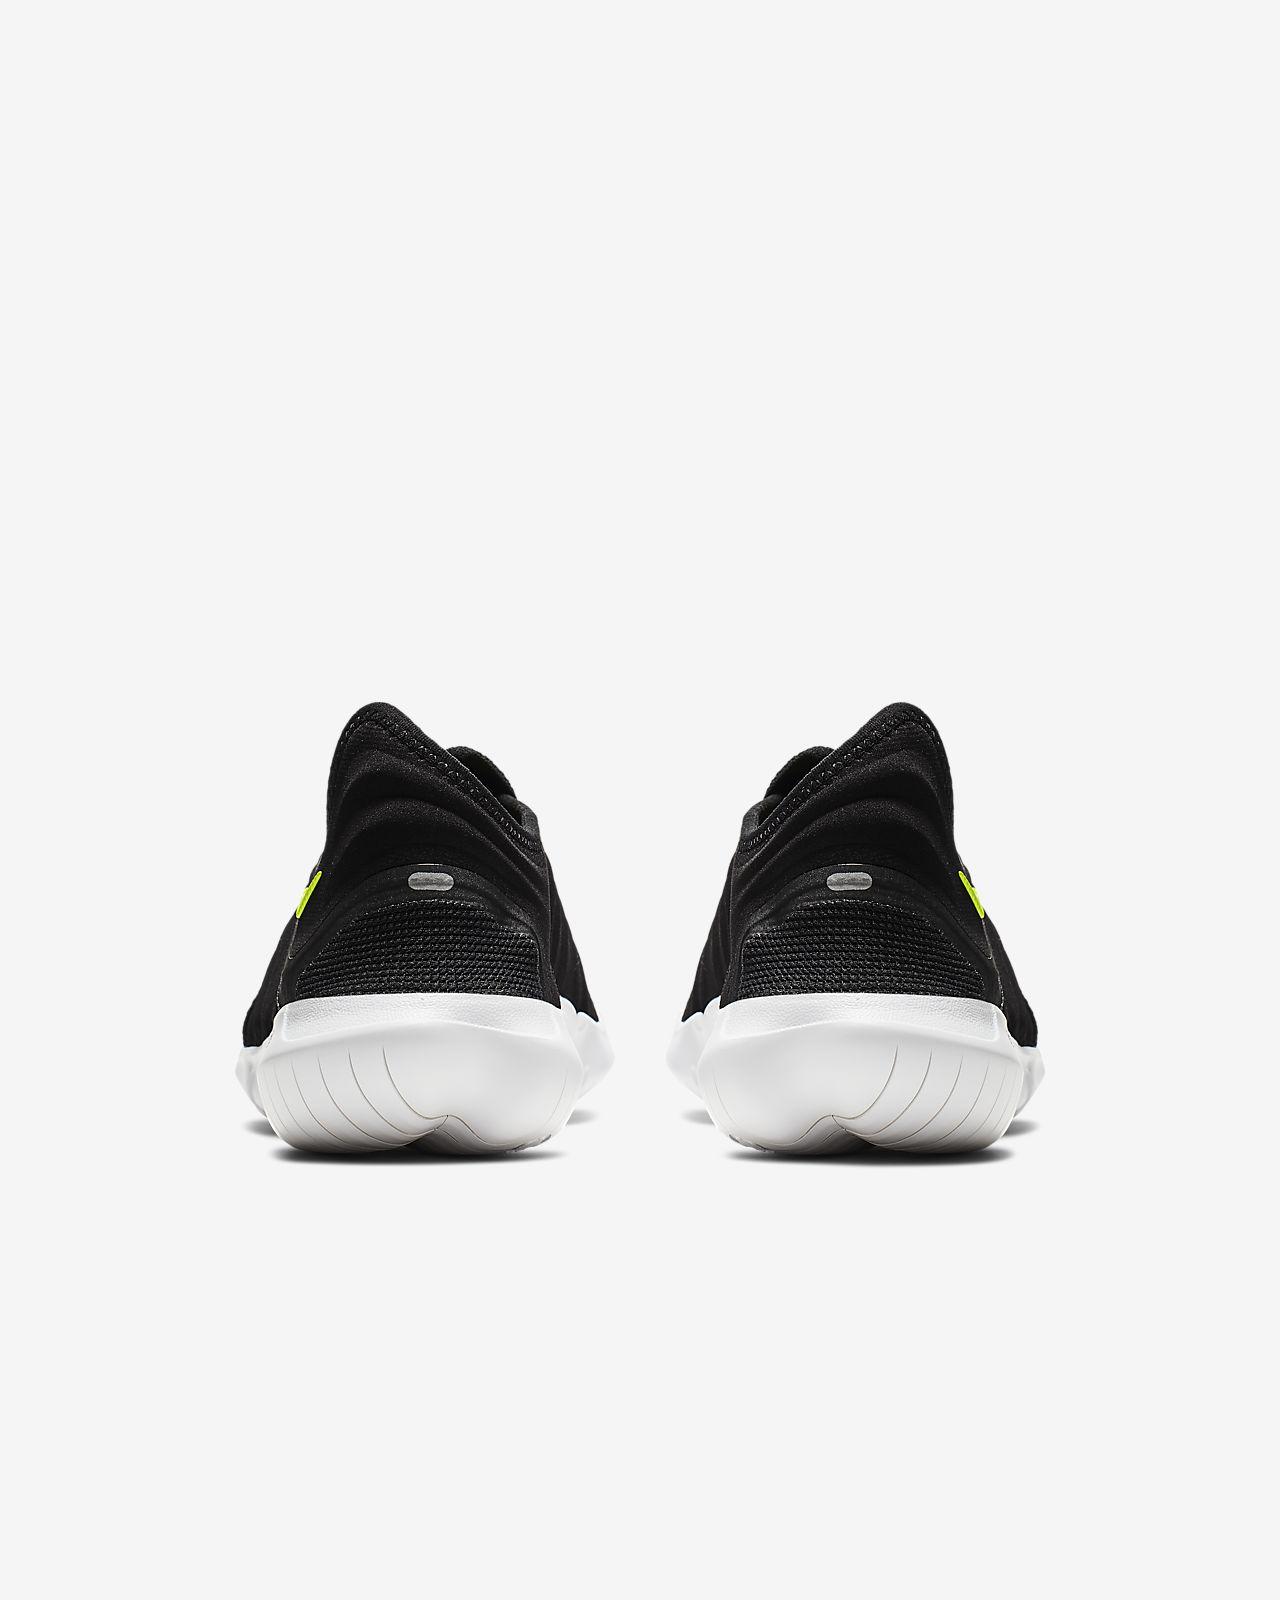 Nike Mercurial Superfly Nike Kobe 11 Gs Mercadolibre